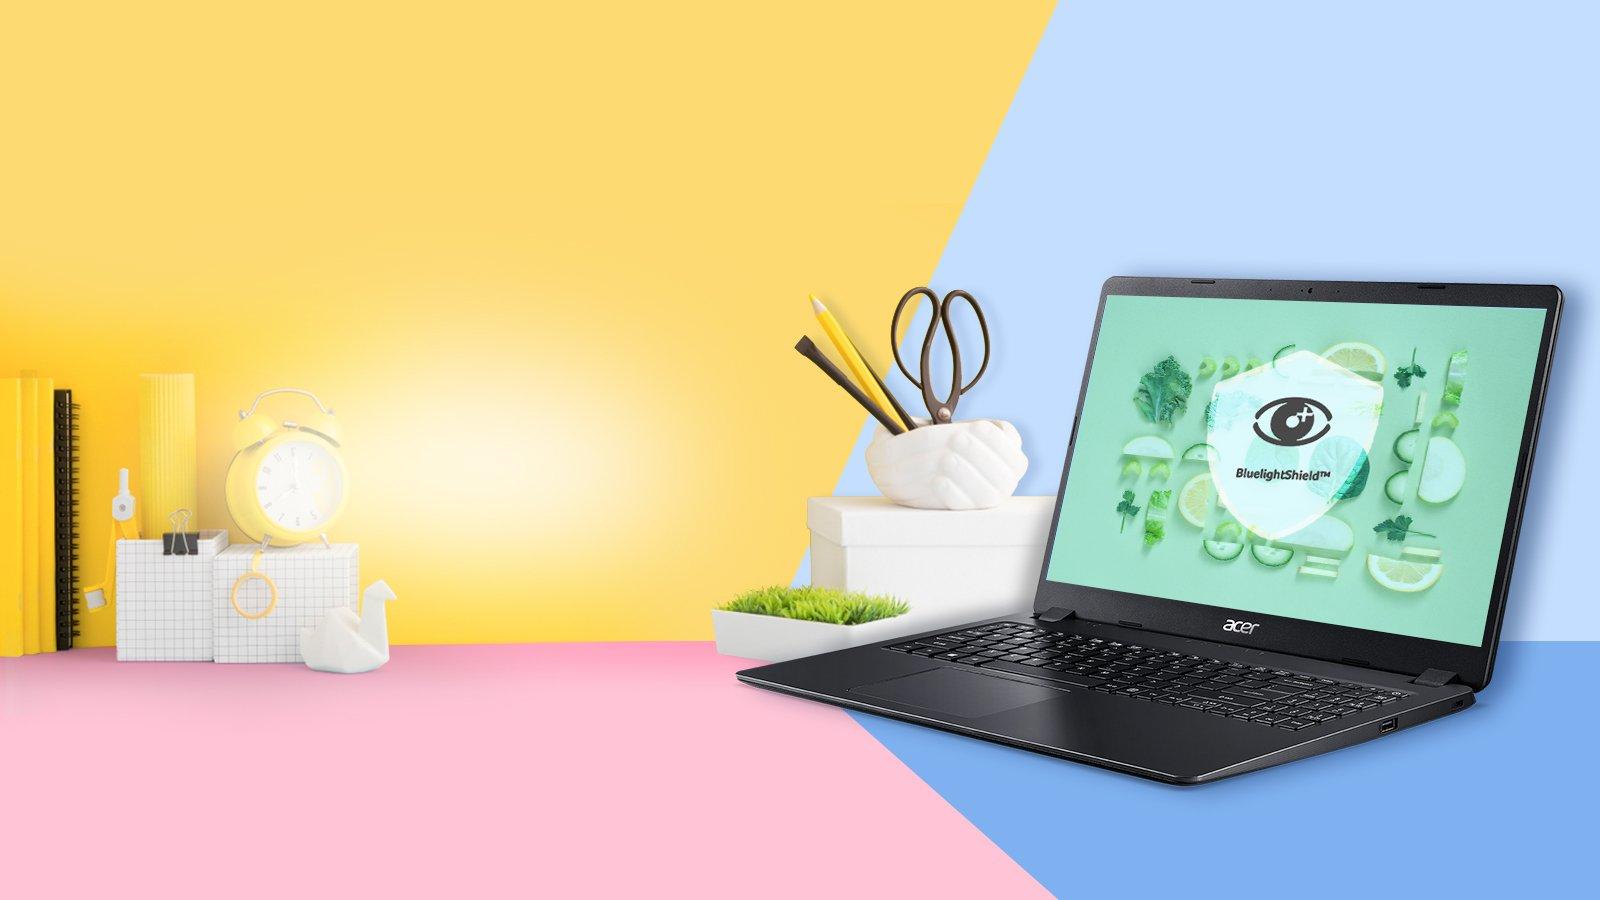 laptop-acer-aspire-3-a315-57g-31yd-4